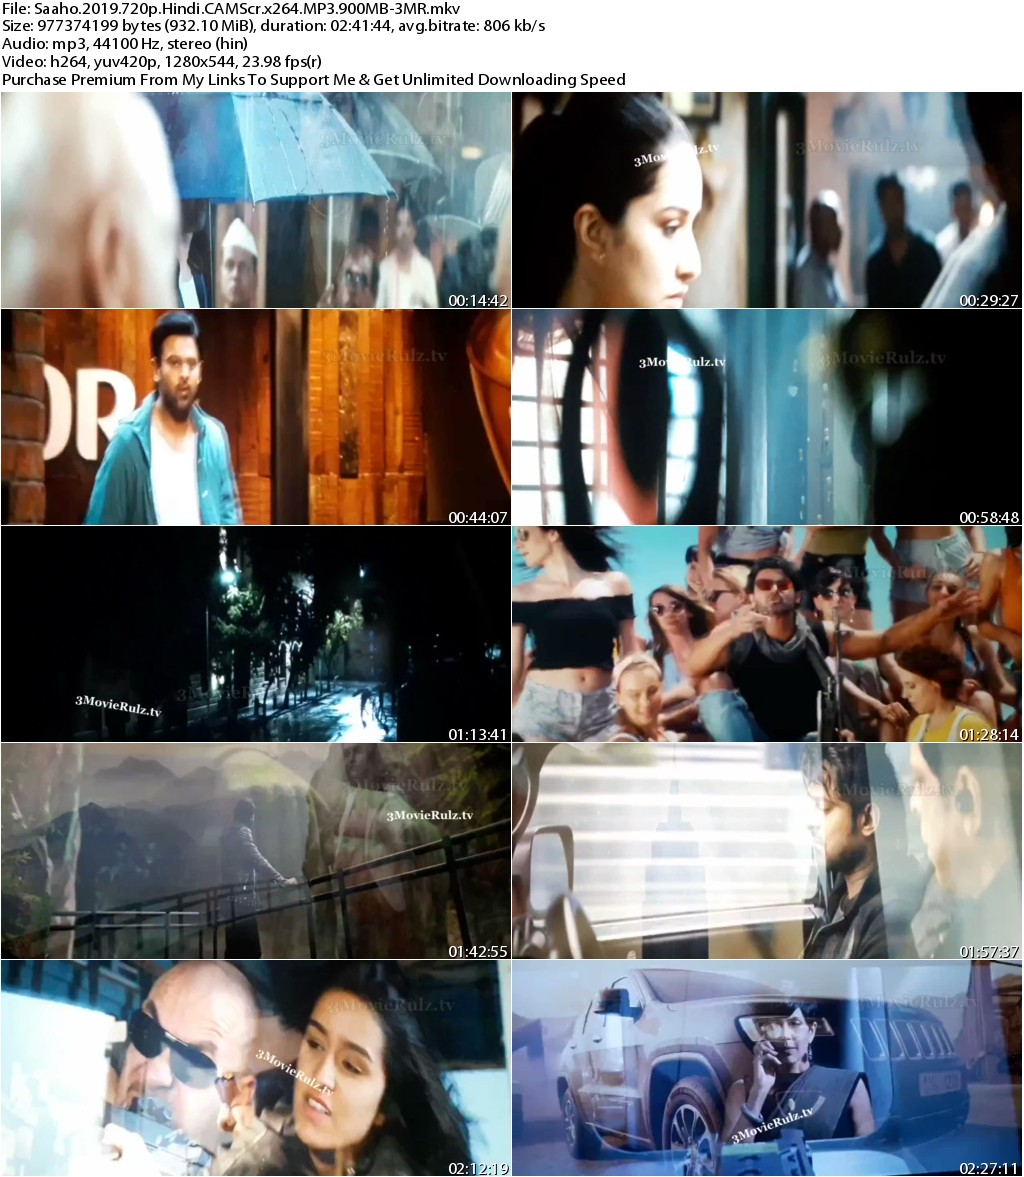 Saaho (2019) Hindi 720p CAMScr x264 MP3 900MB-3MR